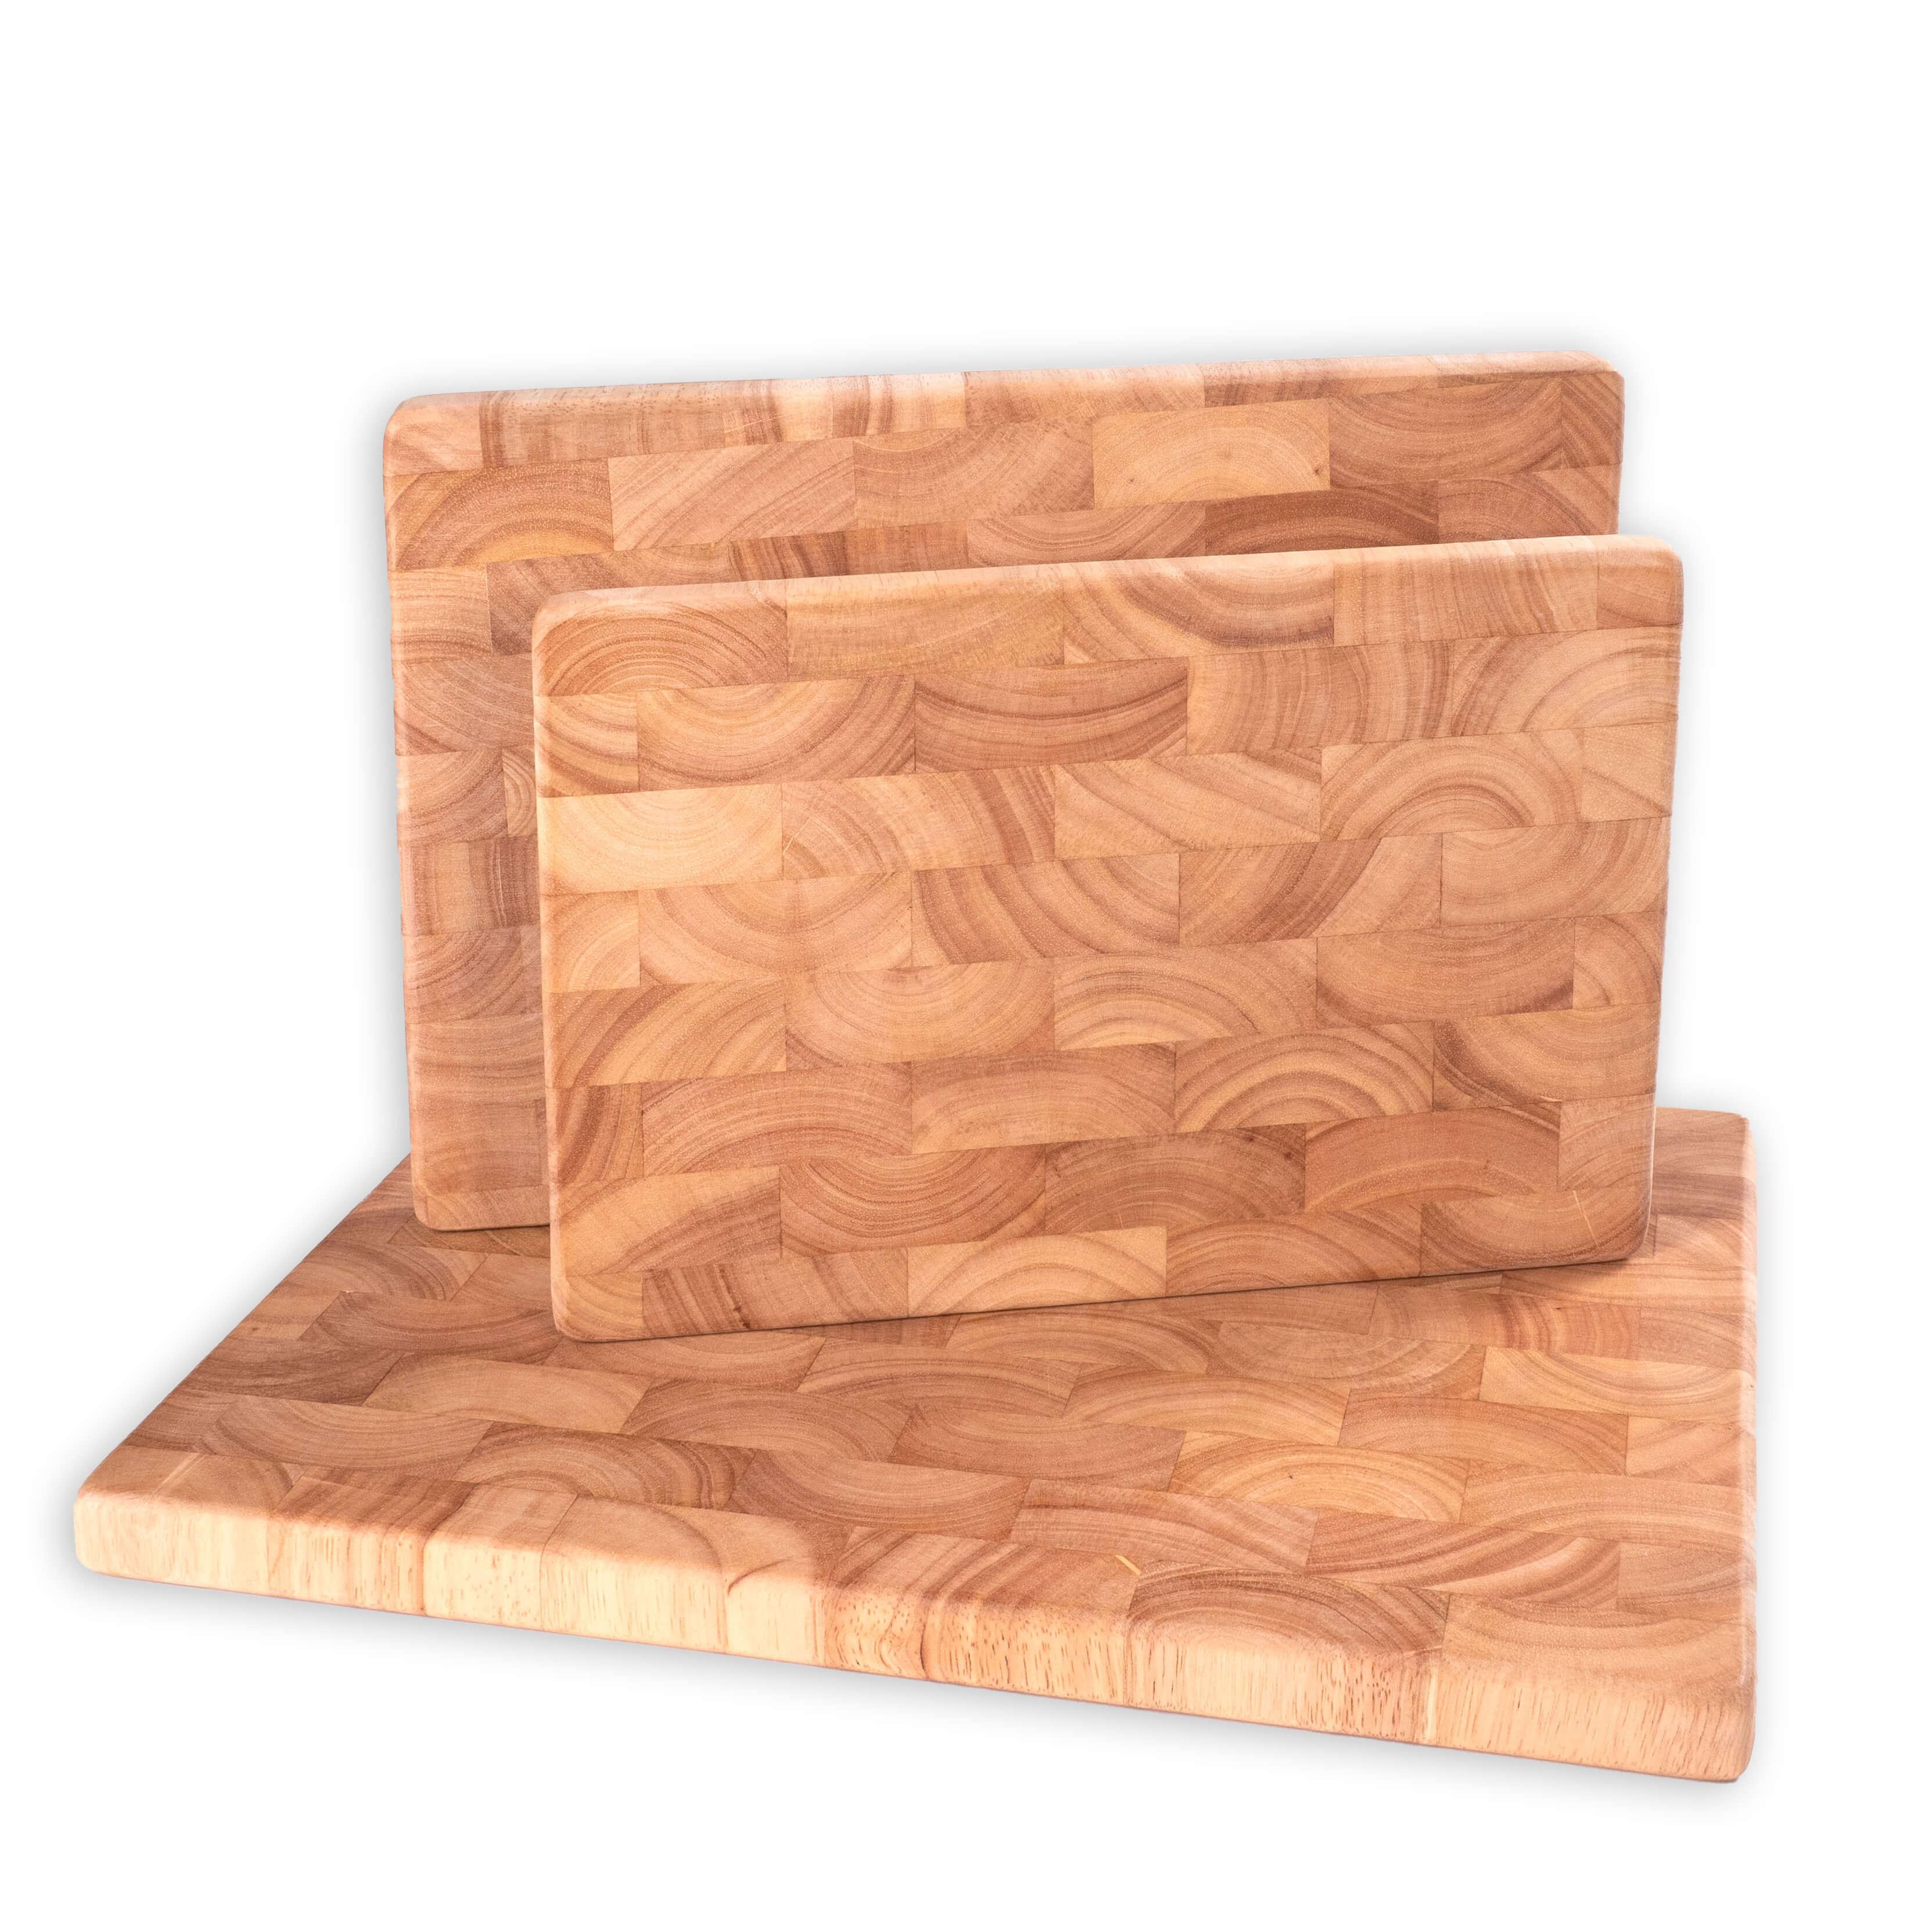 Holz-Schneidebretter aus Gummibaum-Stirnholz im 3er-Set